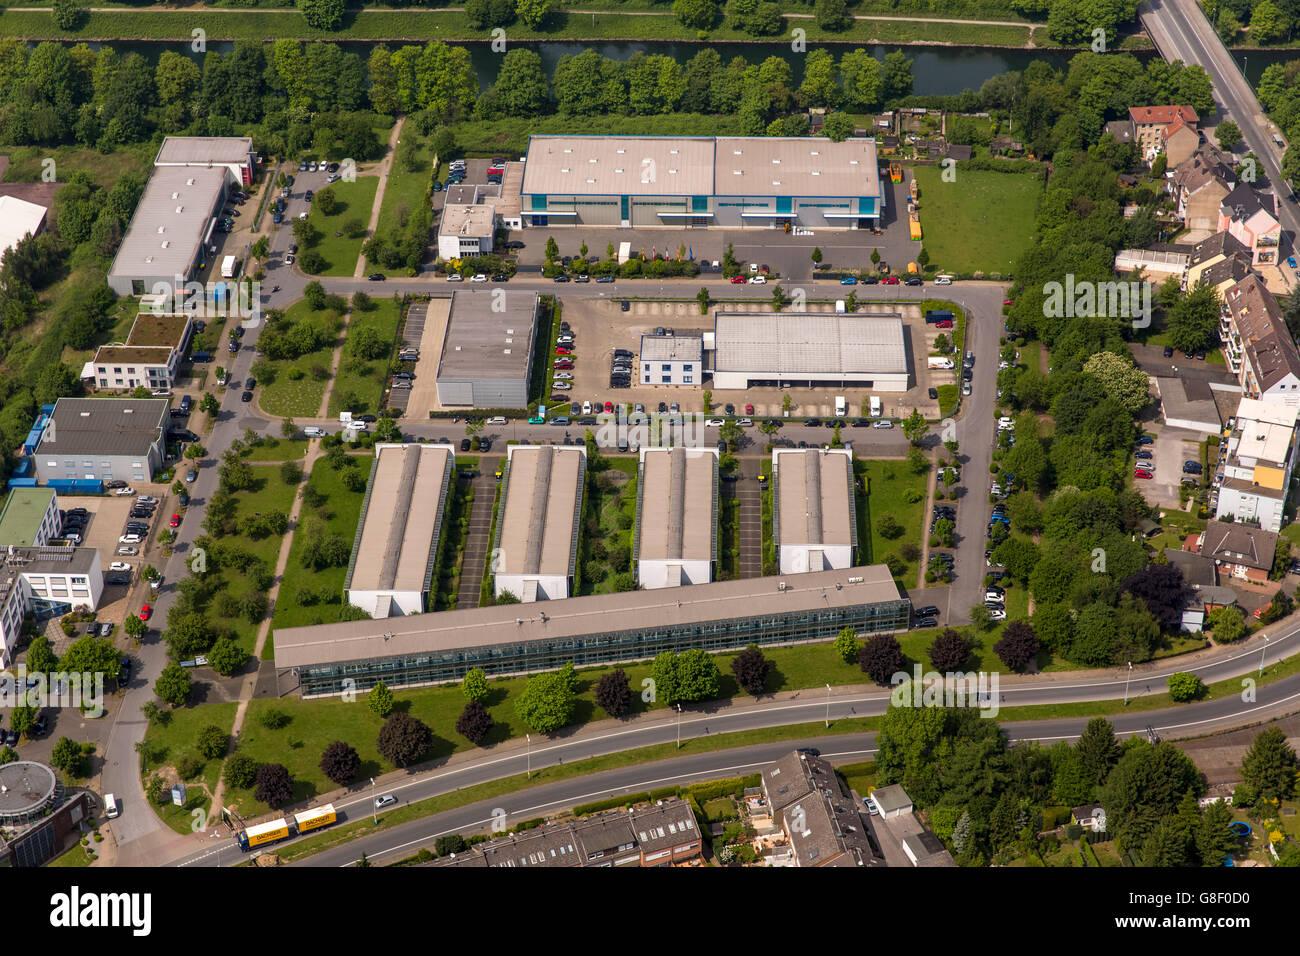 Aerial view, forensics Herne-Wanne, preventive detention, mental hospital, Herne Wanne-Eickel, Herne, Ruhr area, - Stock Image